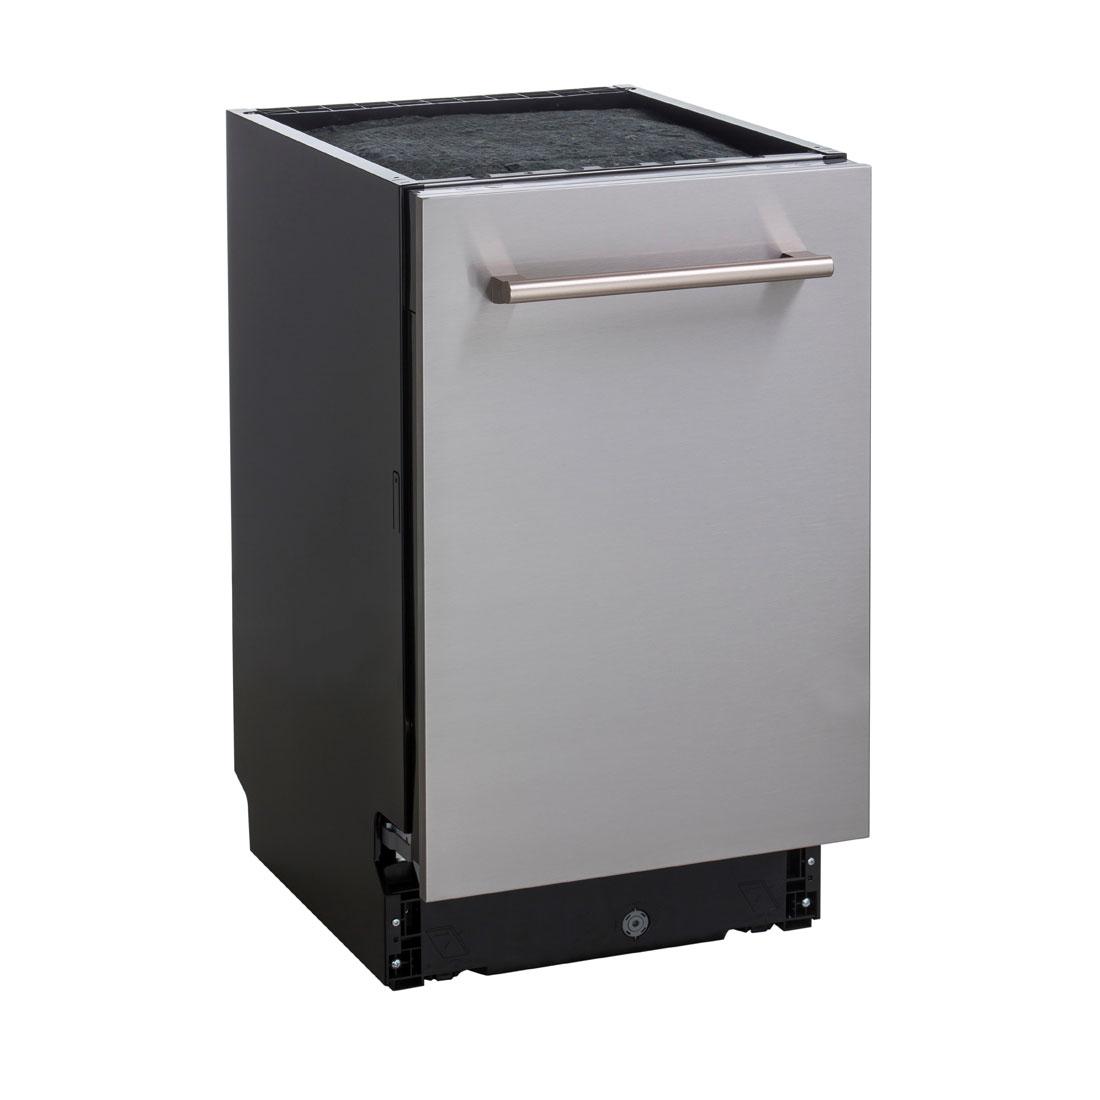 Lava-Louças de Embutir Cuisinart Casual Cooking 10 serviços Inox 45cm 220V